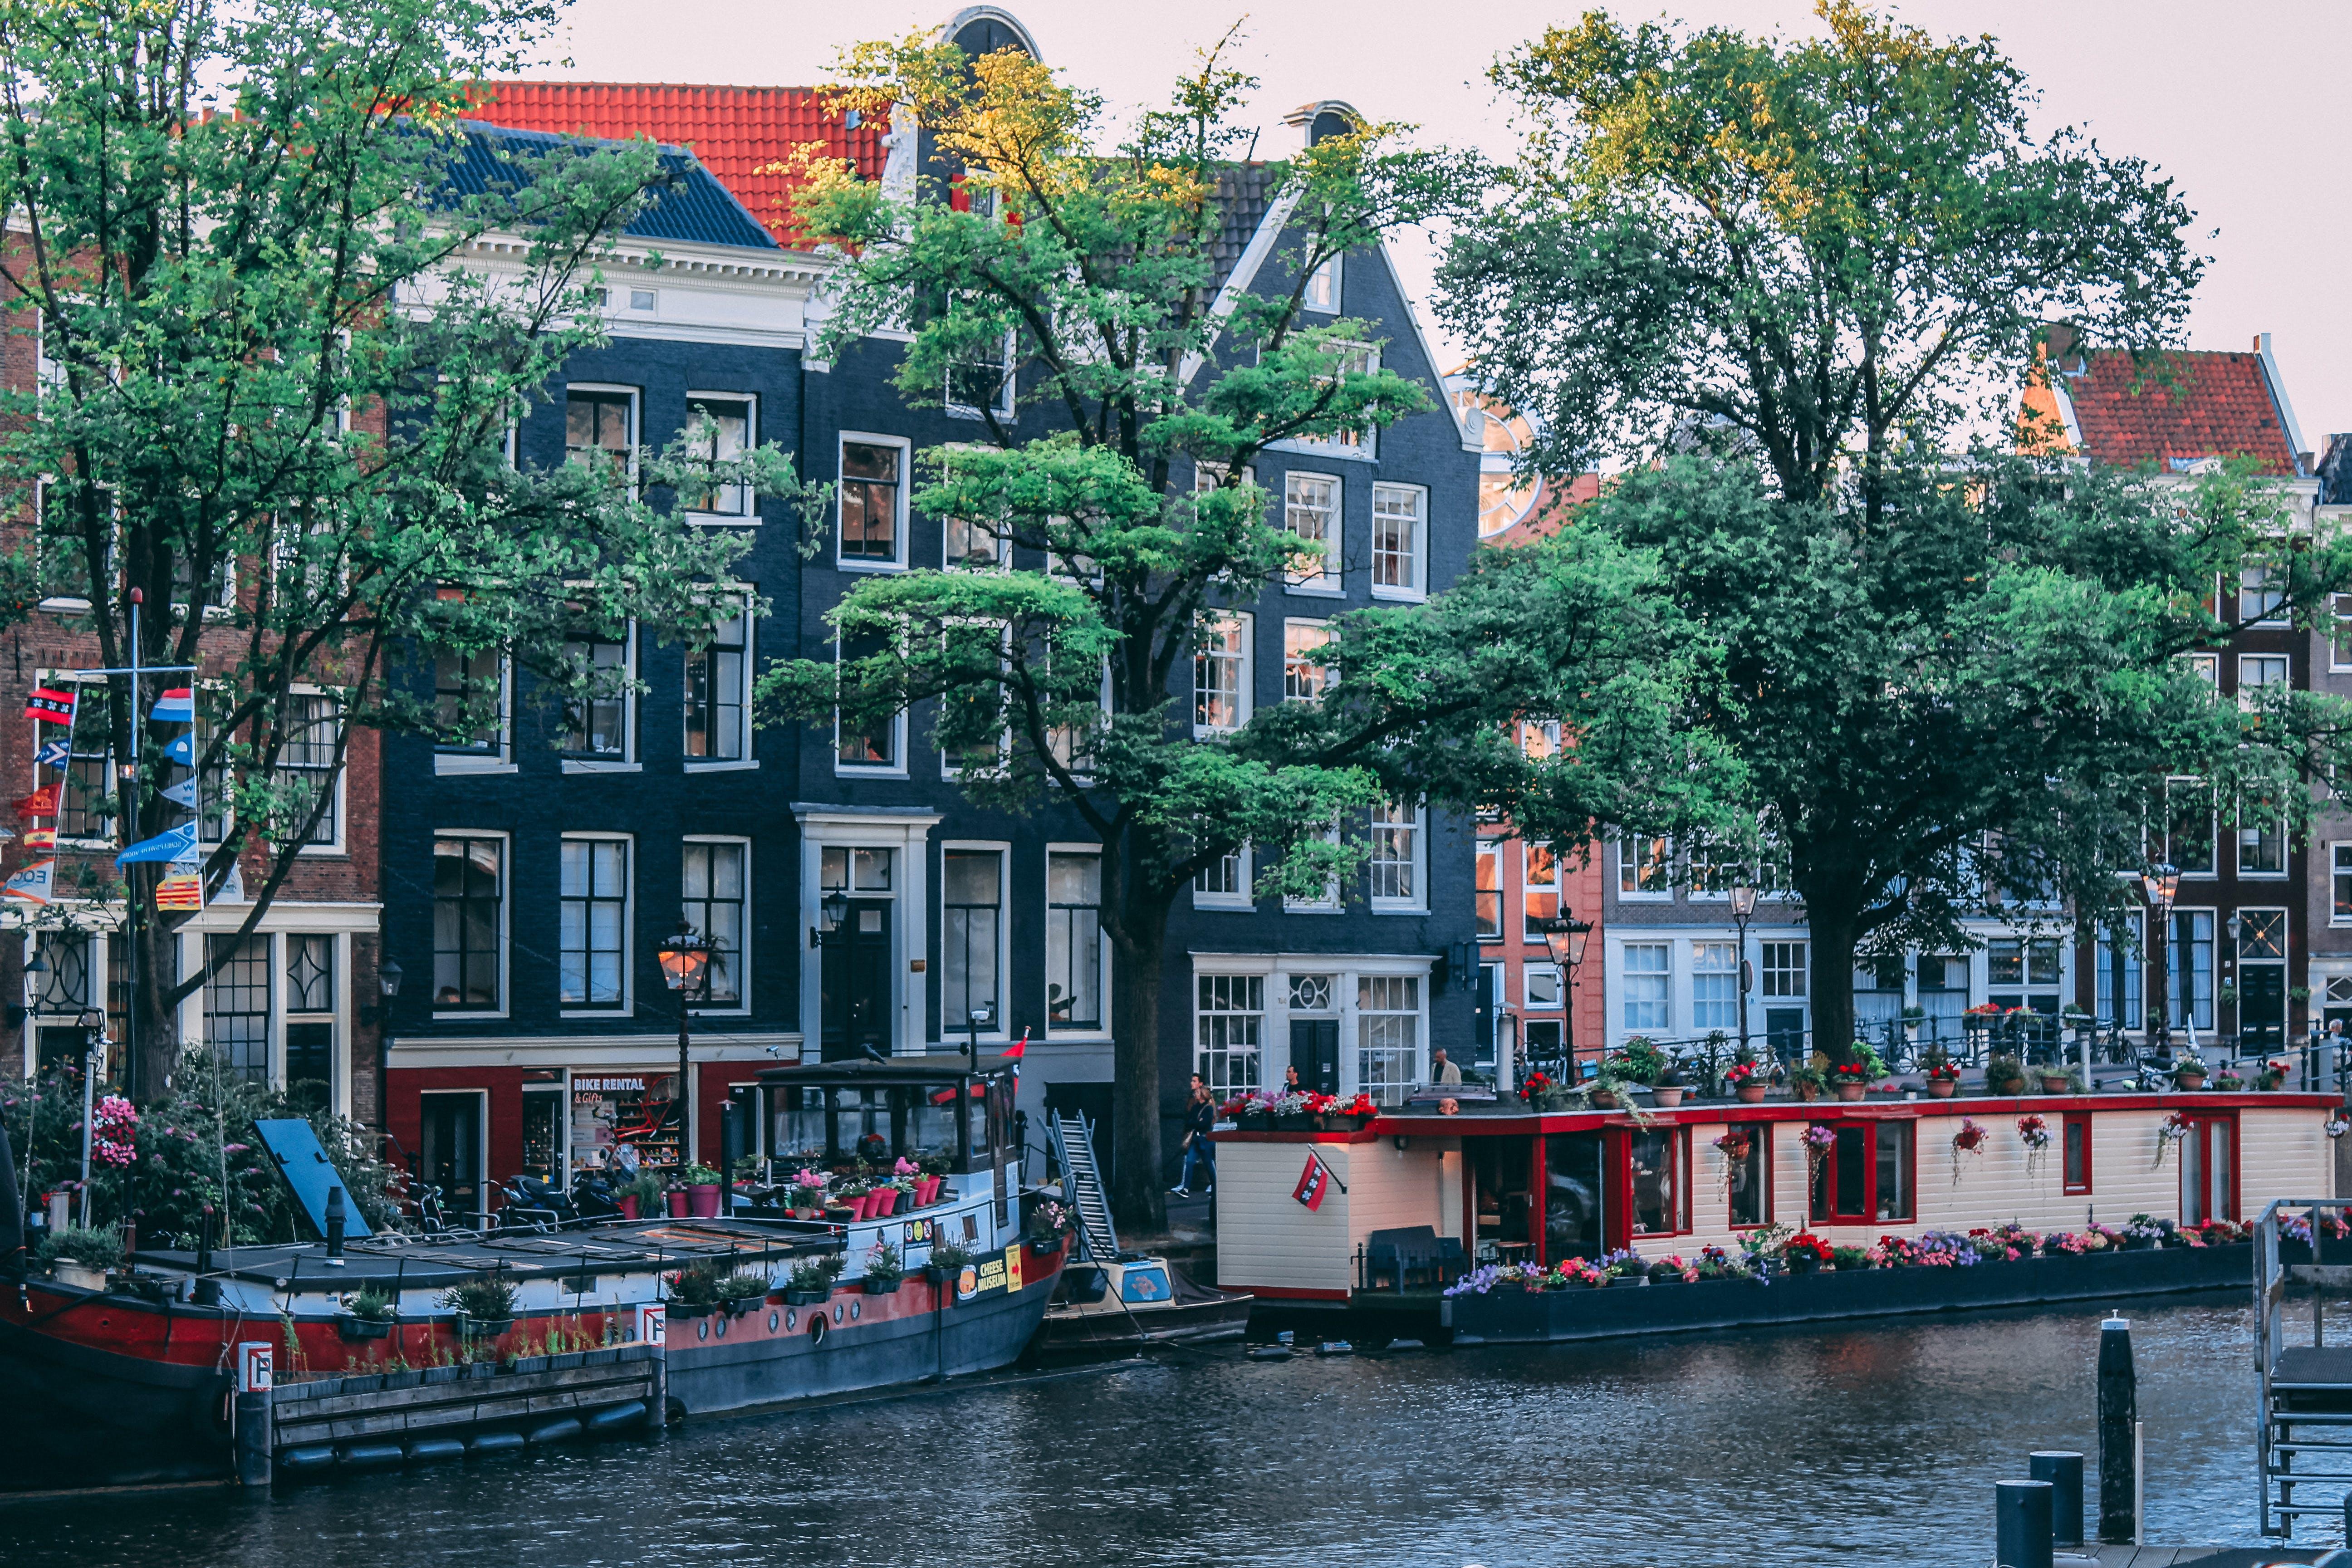 amsterdam, classic amsterdam